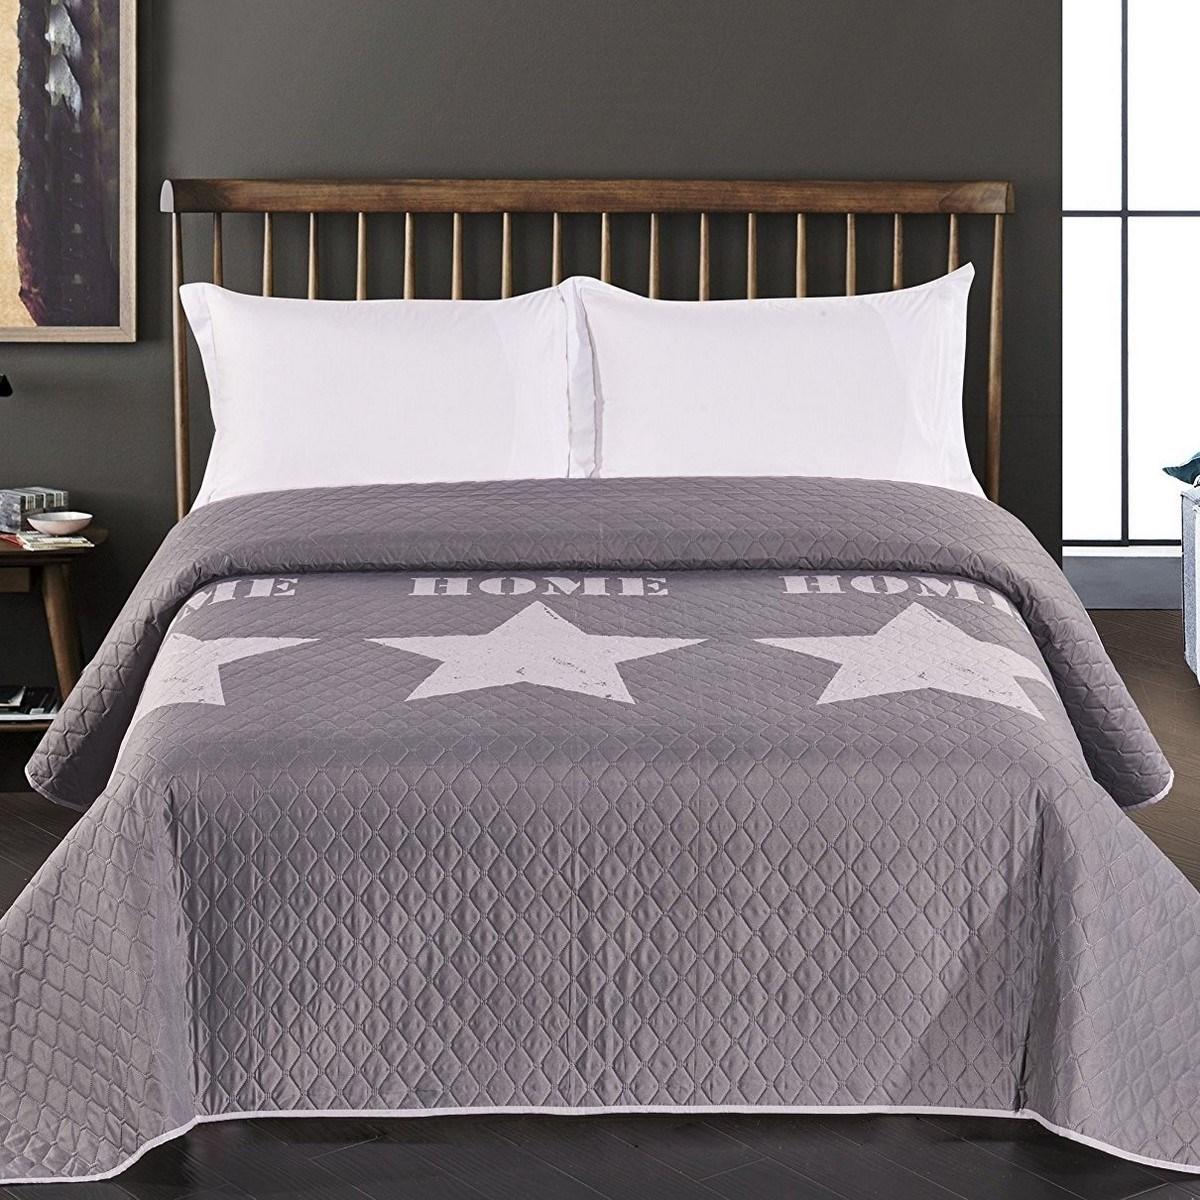 decoking starly gytakar 240 x 260 cm lakberendez s. Black Bedroom Furniture Sets. Home Design Ideas